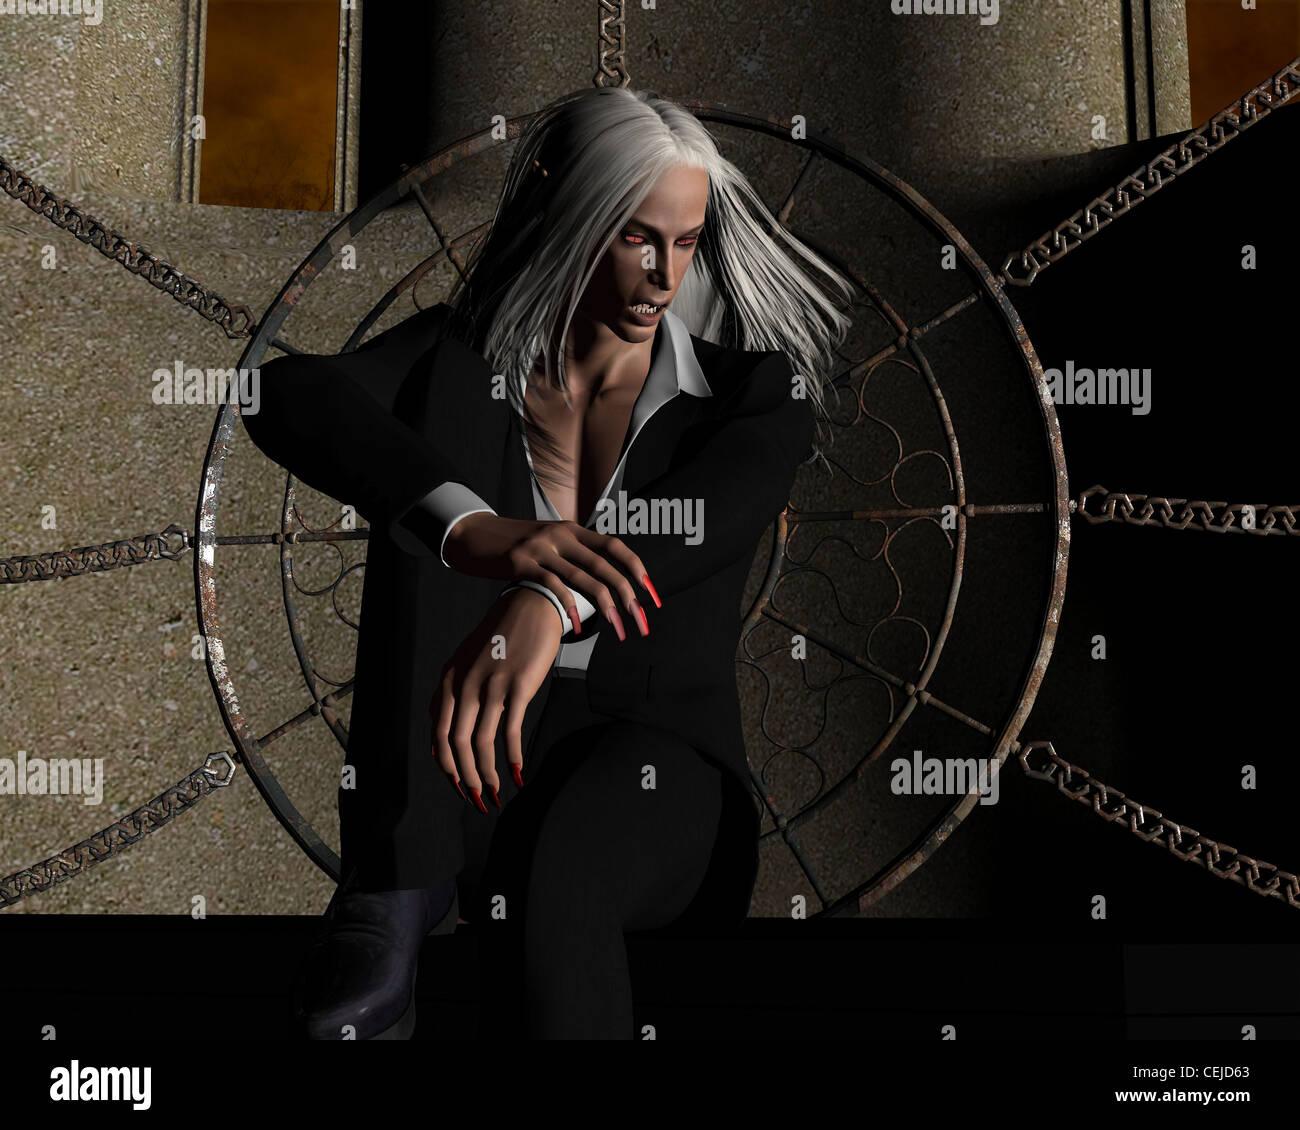 White Haired Vampire - Stock Image